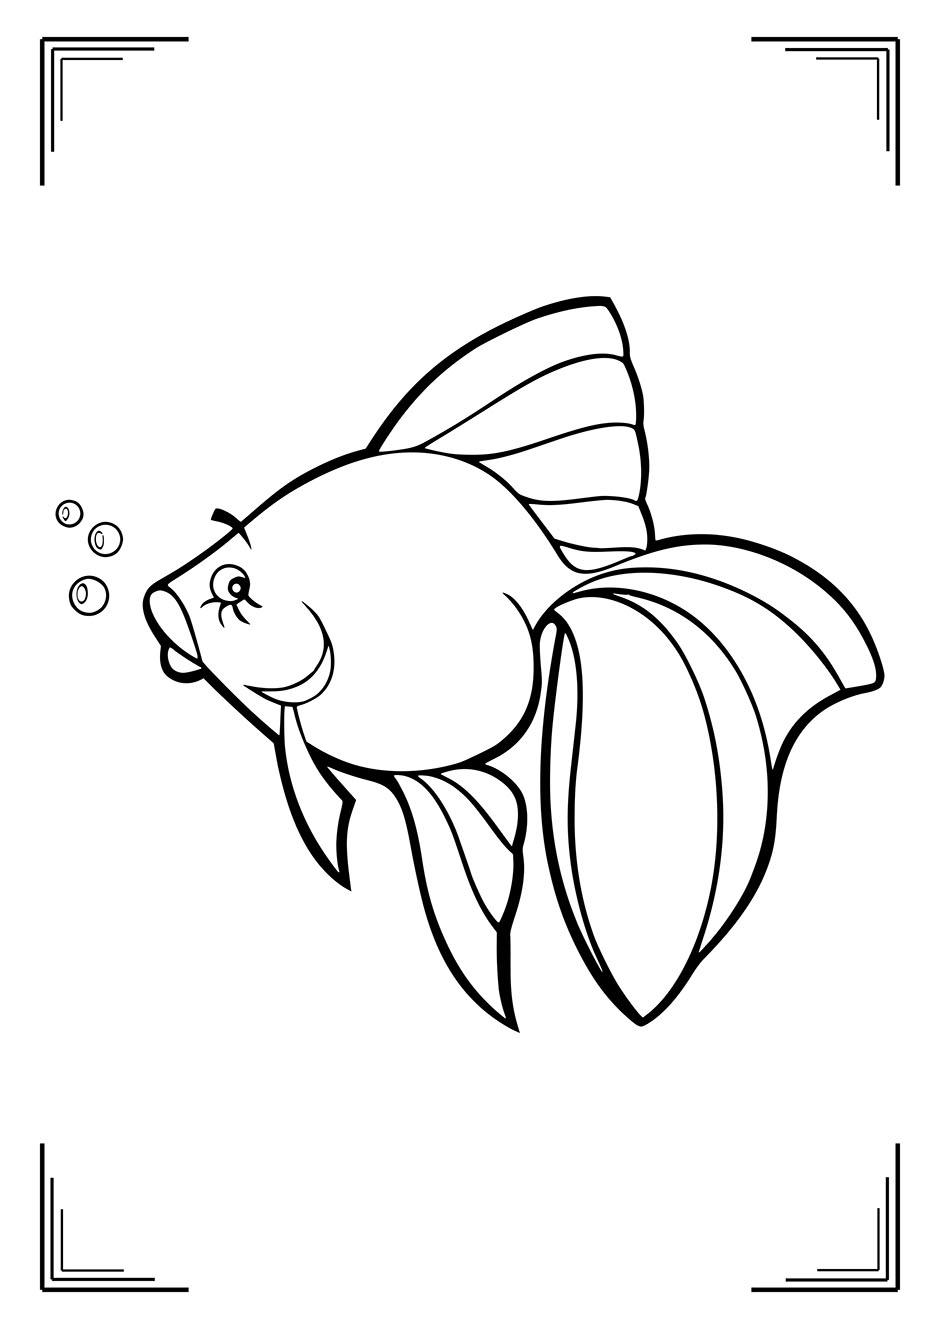 Раскраска: рыбка с пузырьками — raskraski-a4.ru